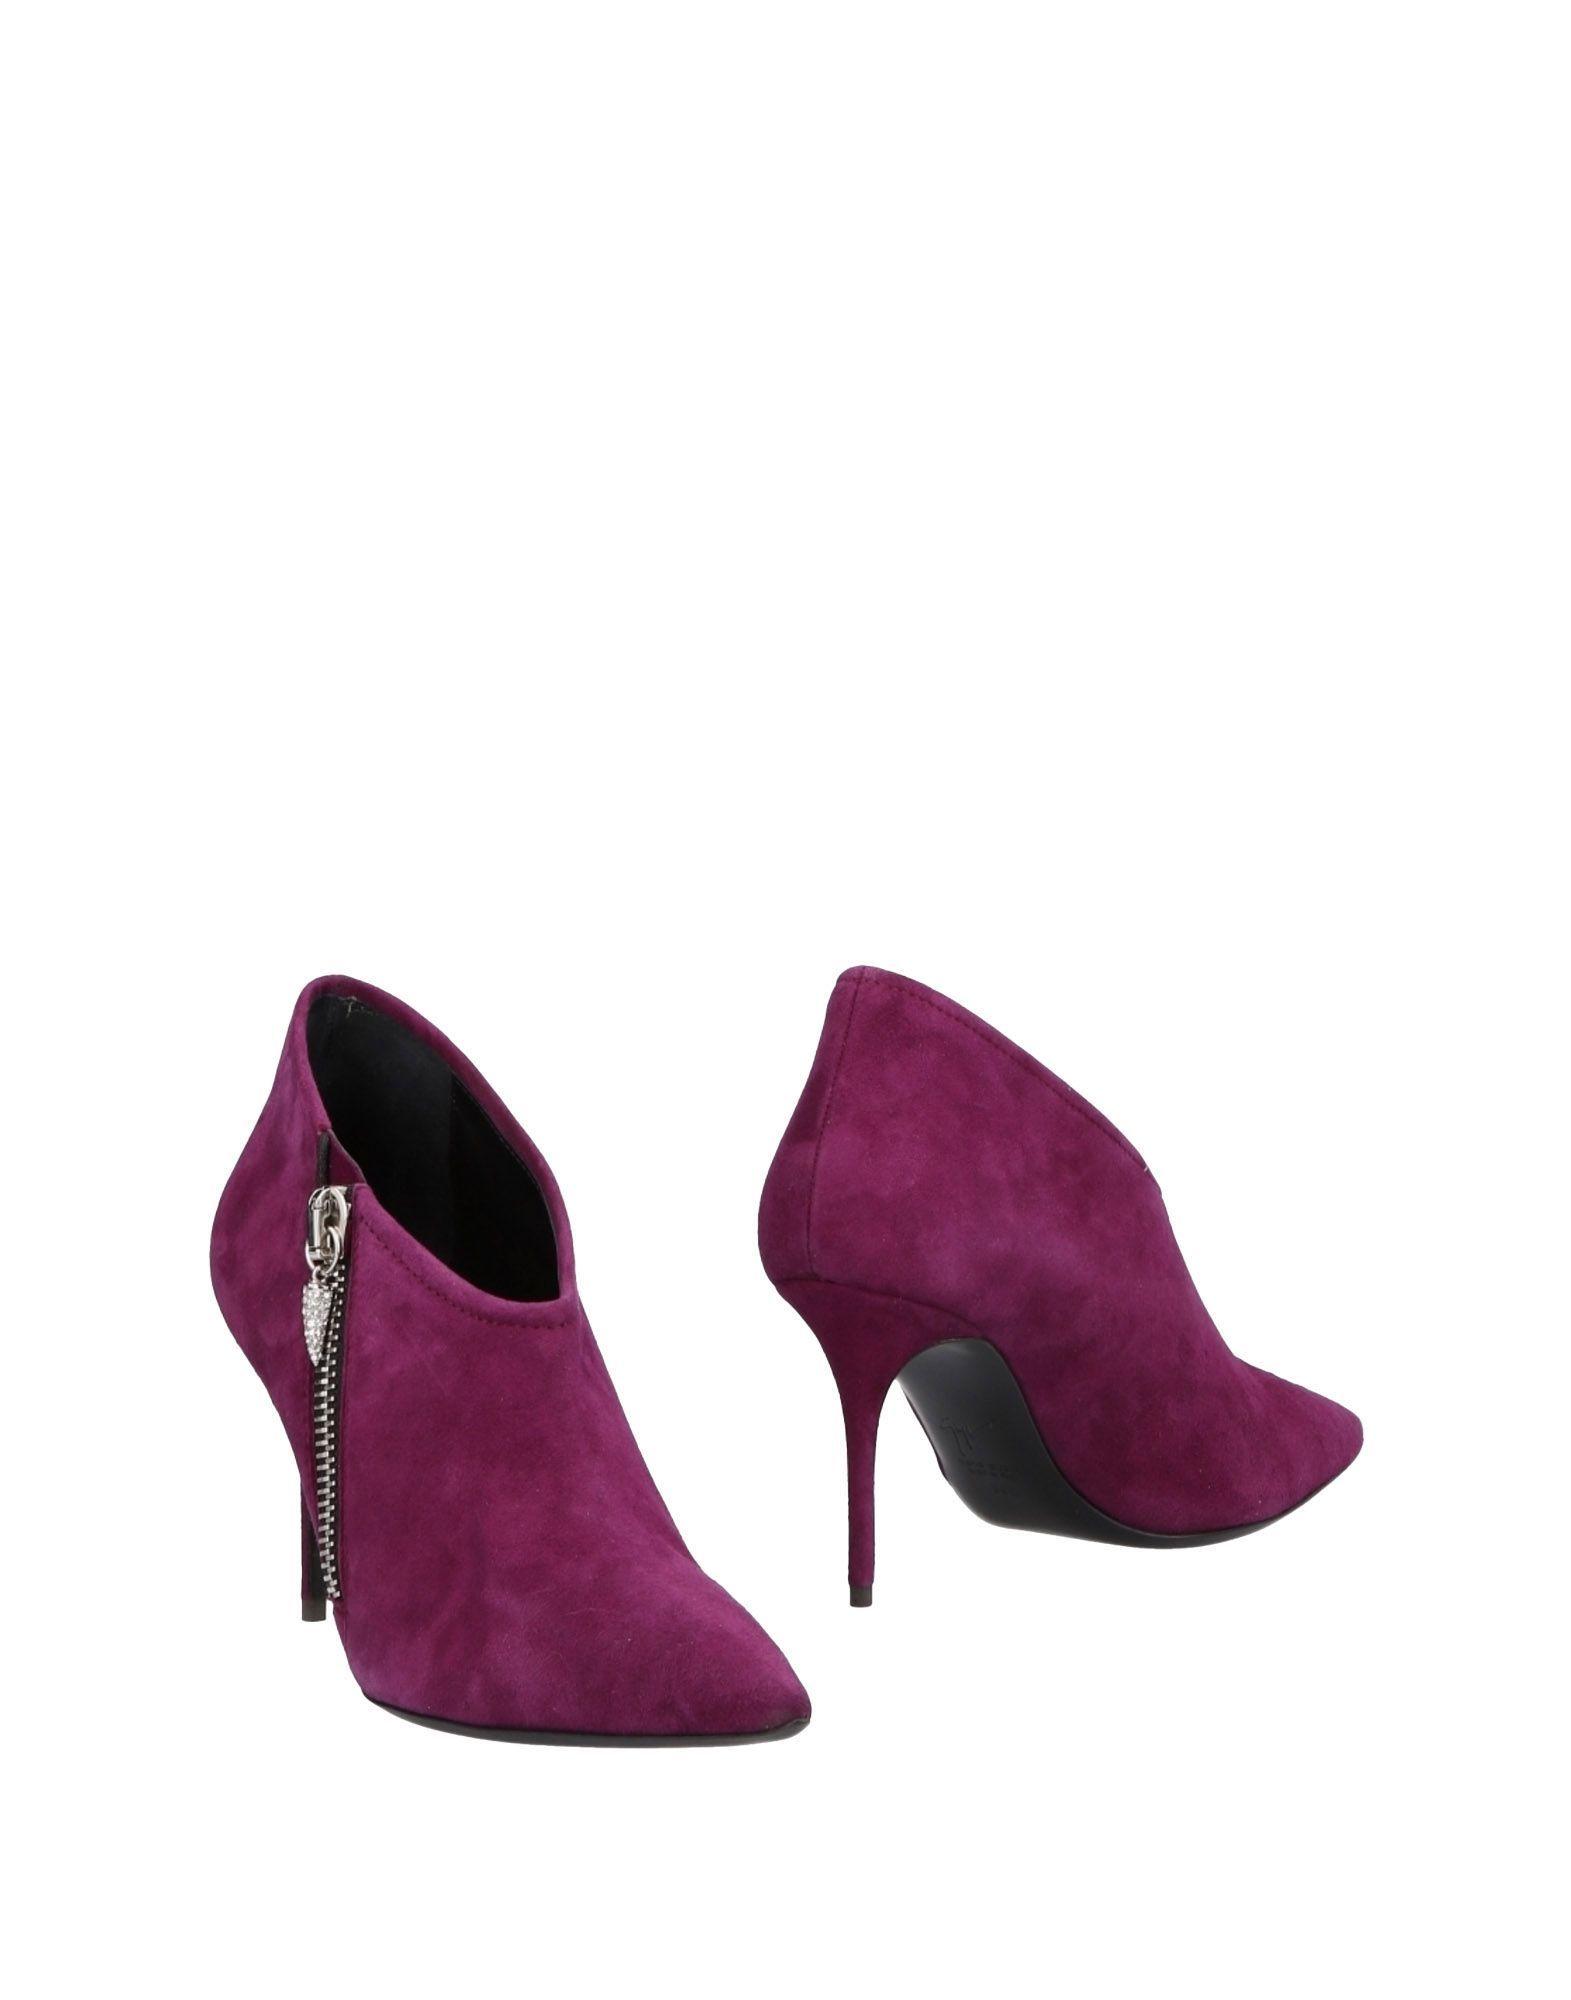 Giuseppe Zanotti Women's Shoe Boots Leather